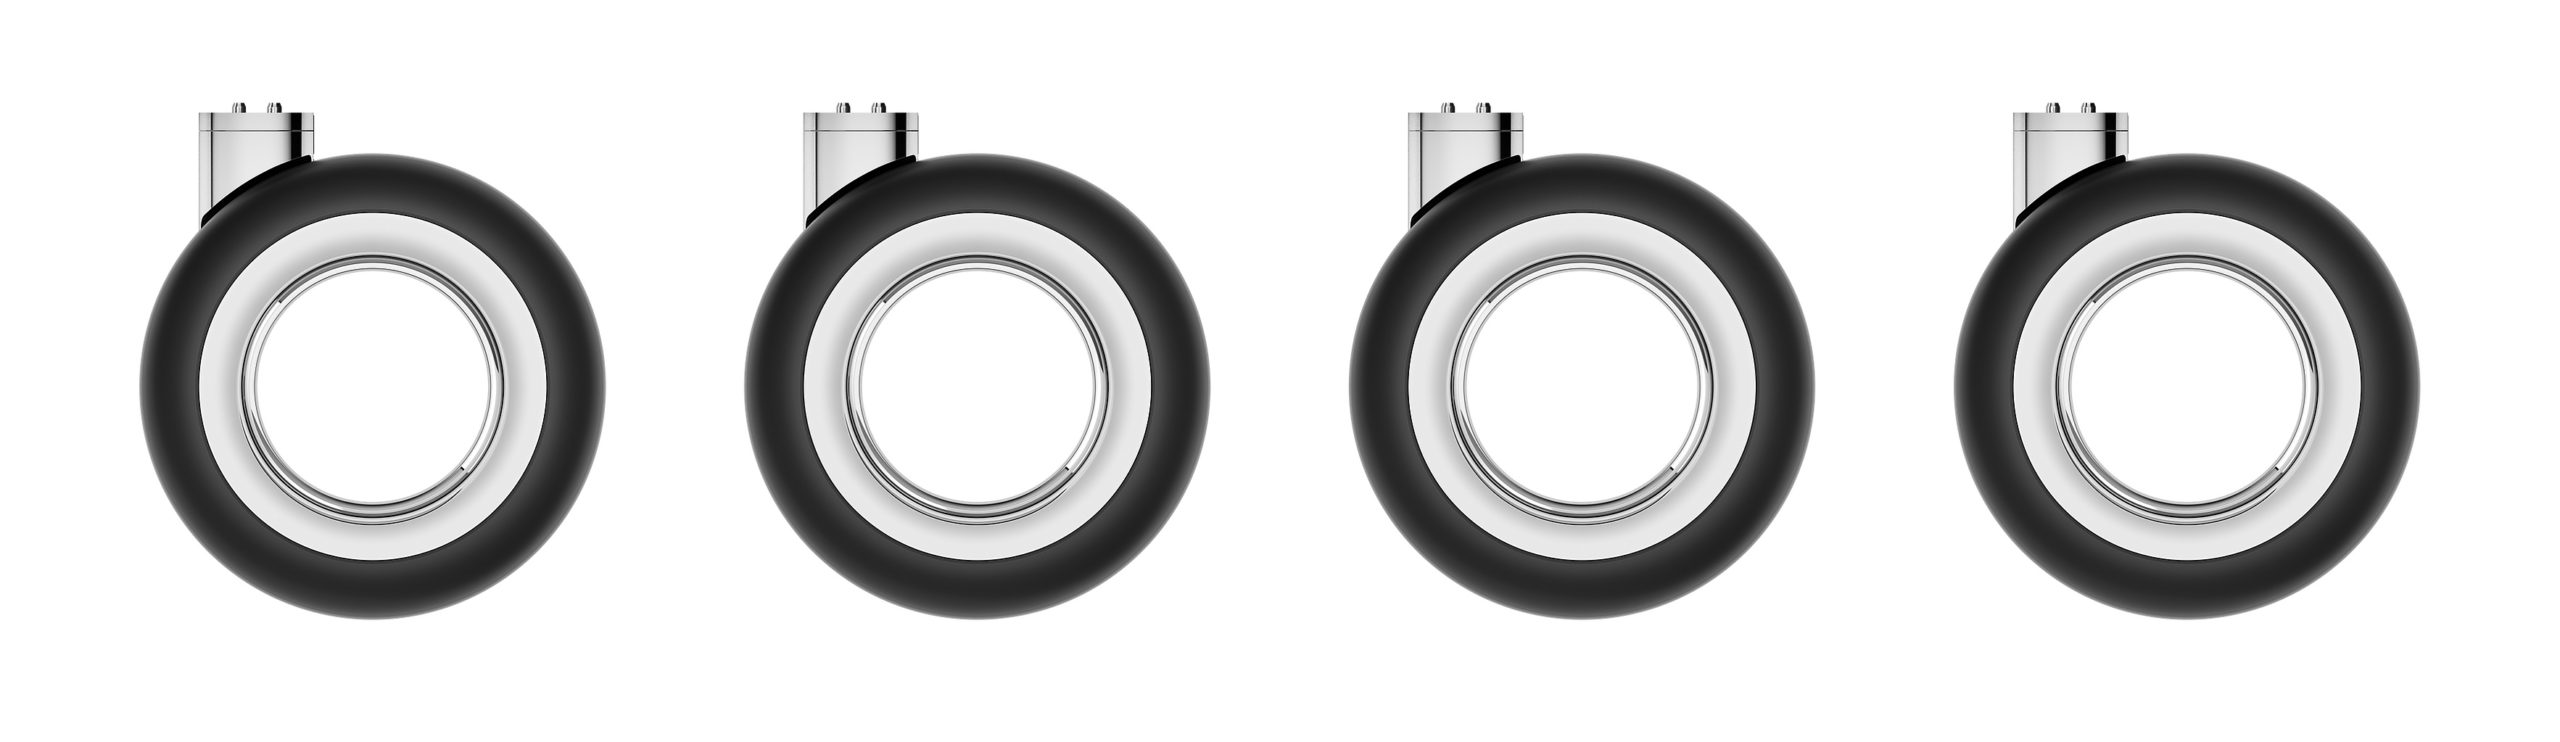 Rodas do Mac Pro